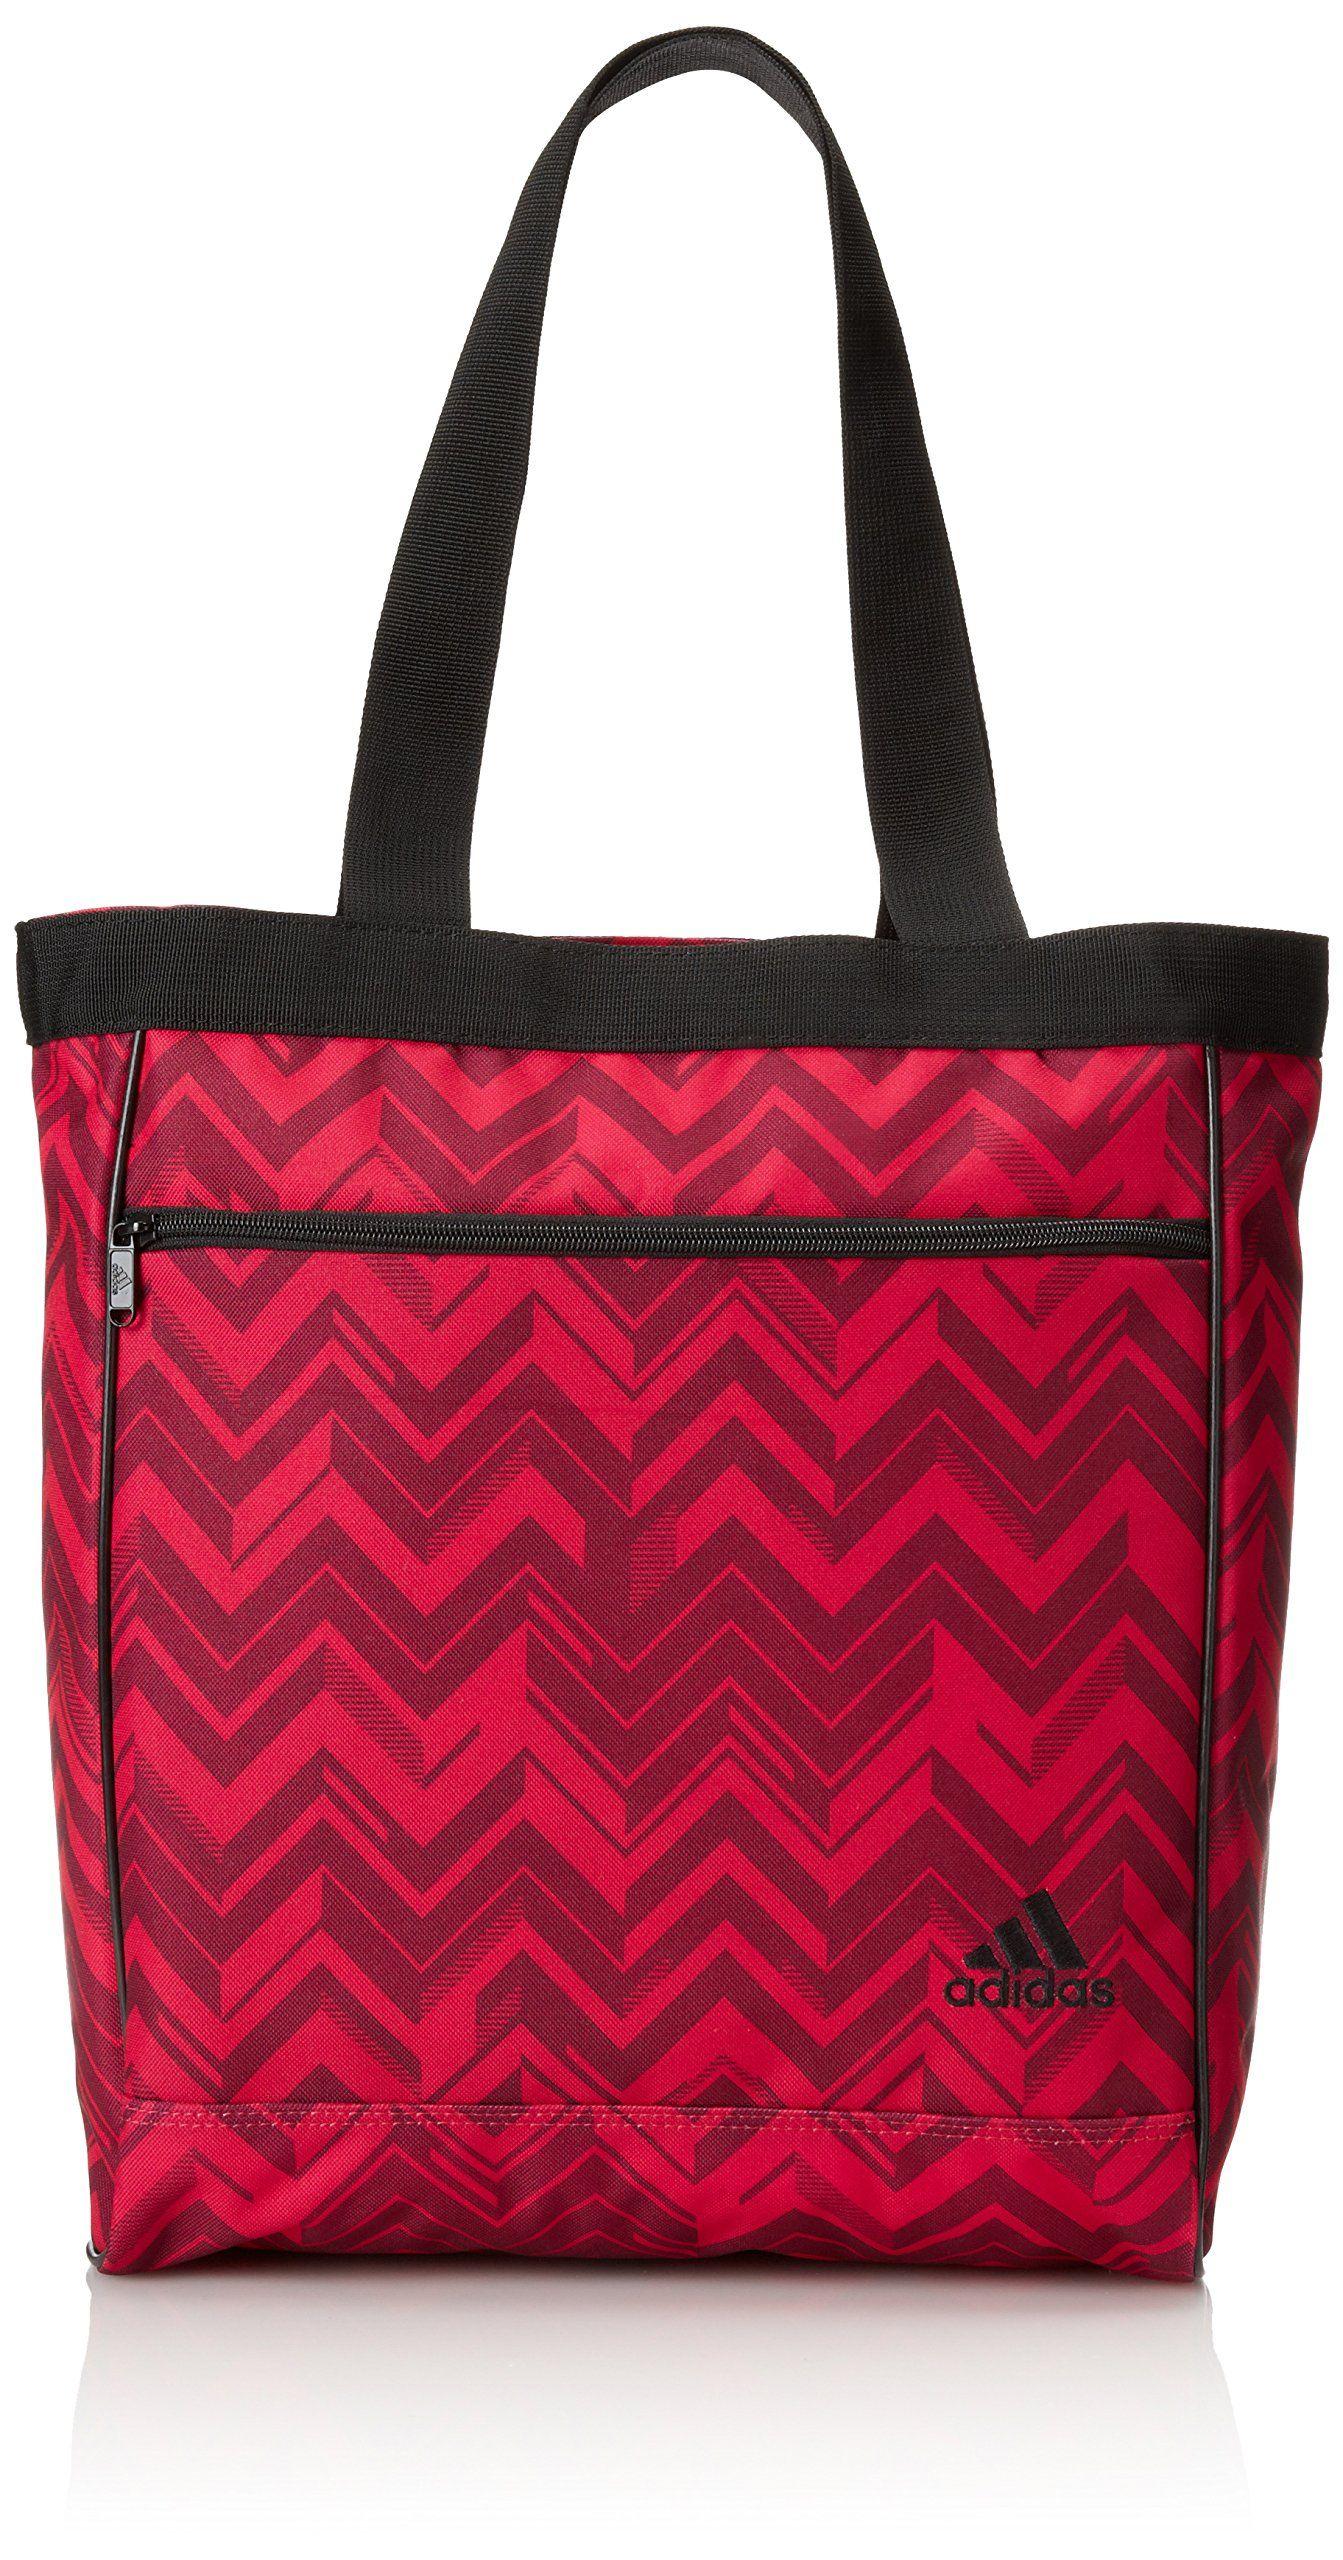 34c7145363  25.00 Amazon.com  adidas Women s Studio Club Bag